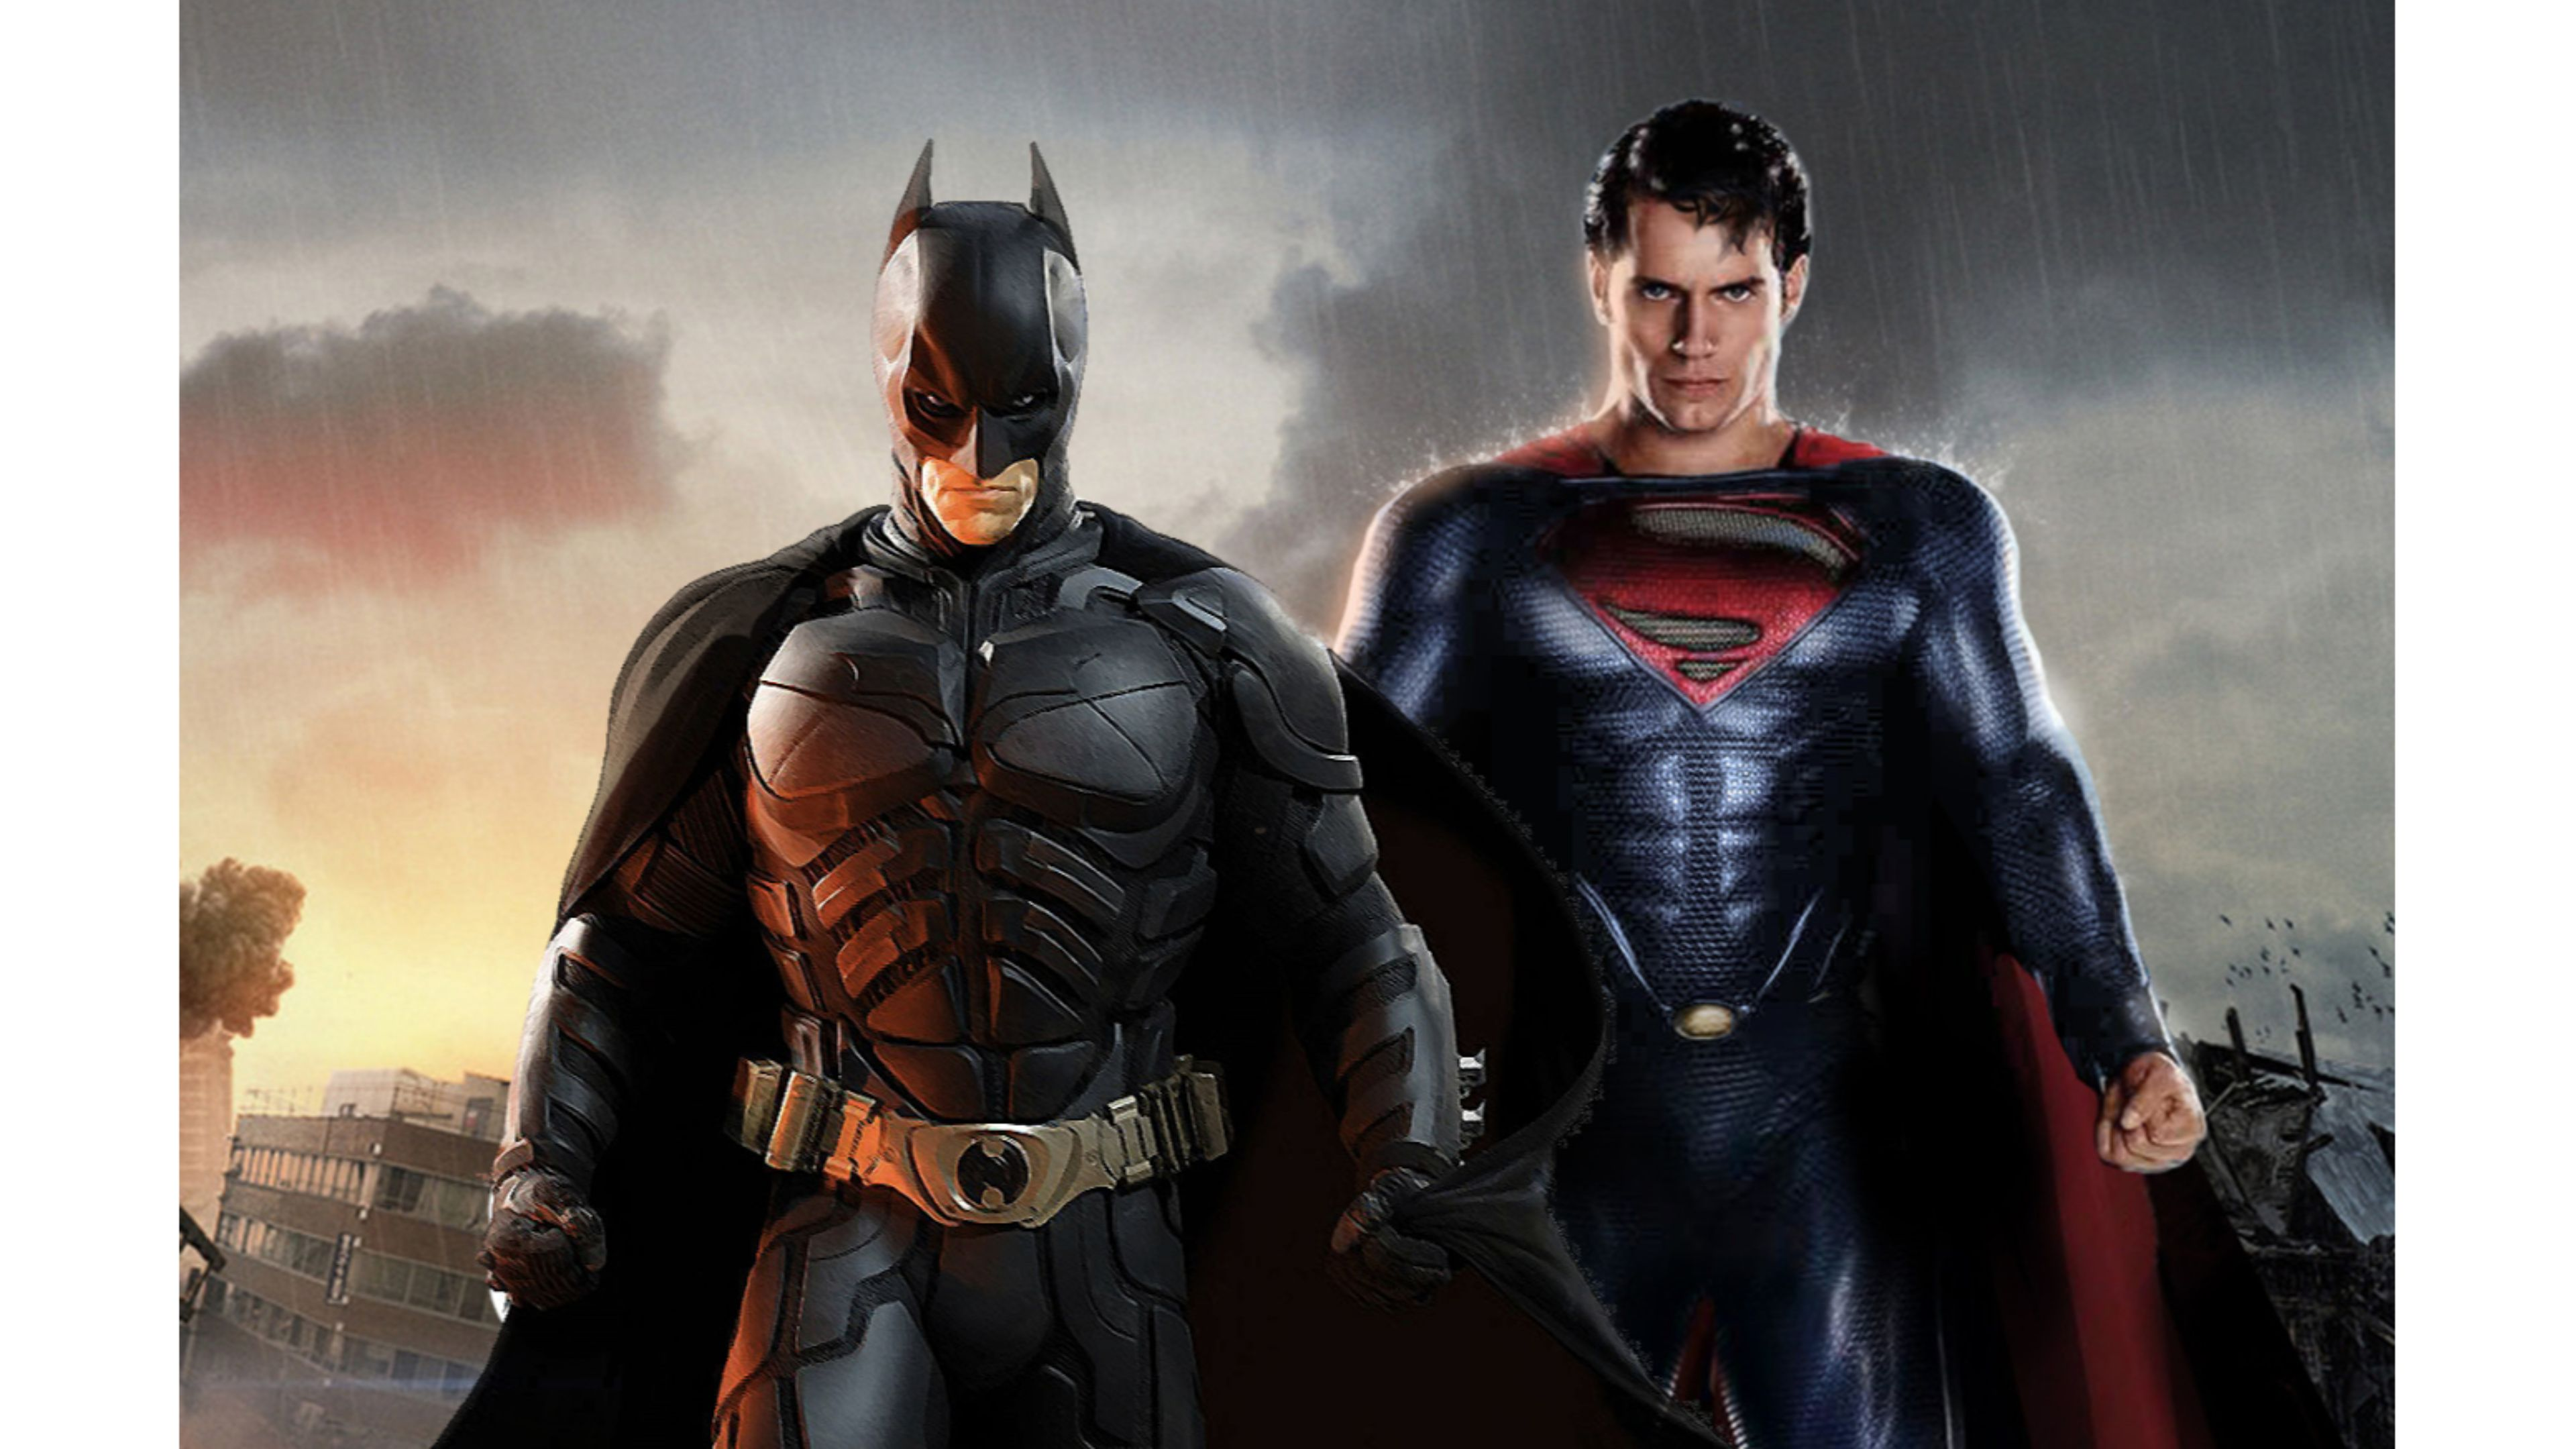 Batman Vs Superman Full Movie Online Free